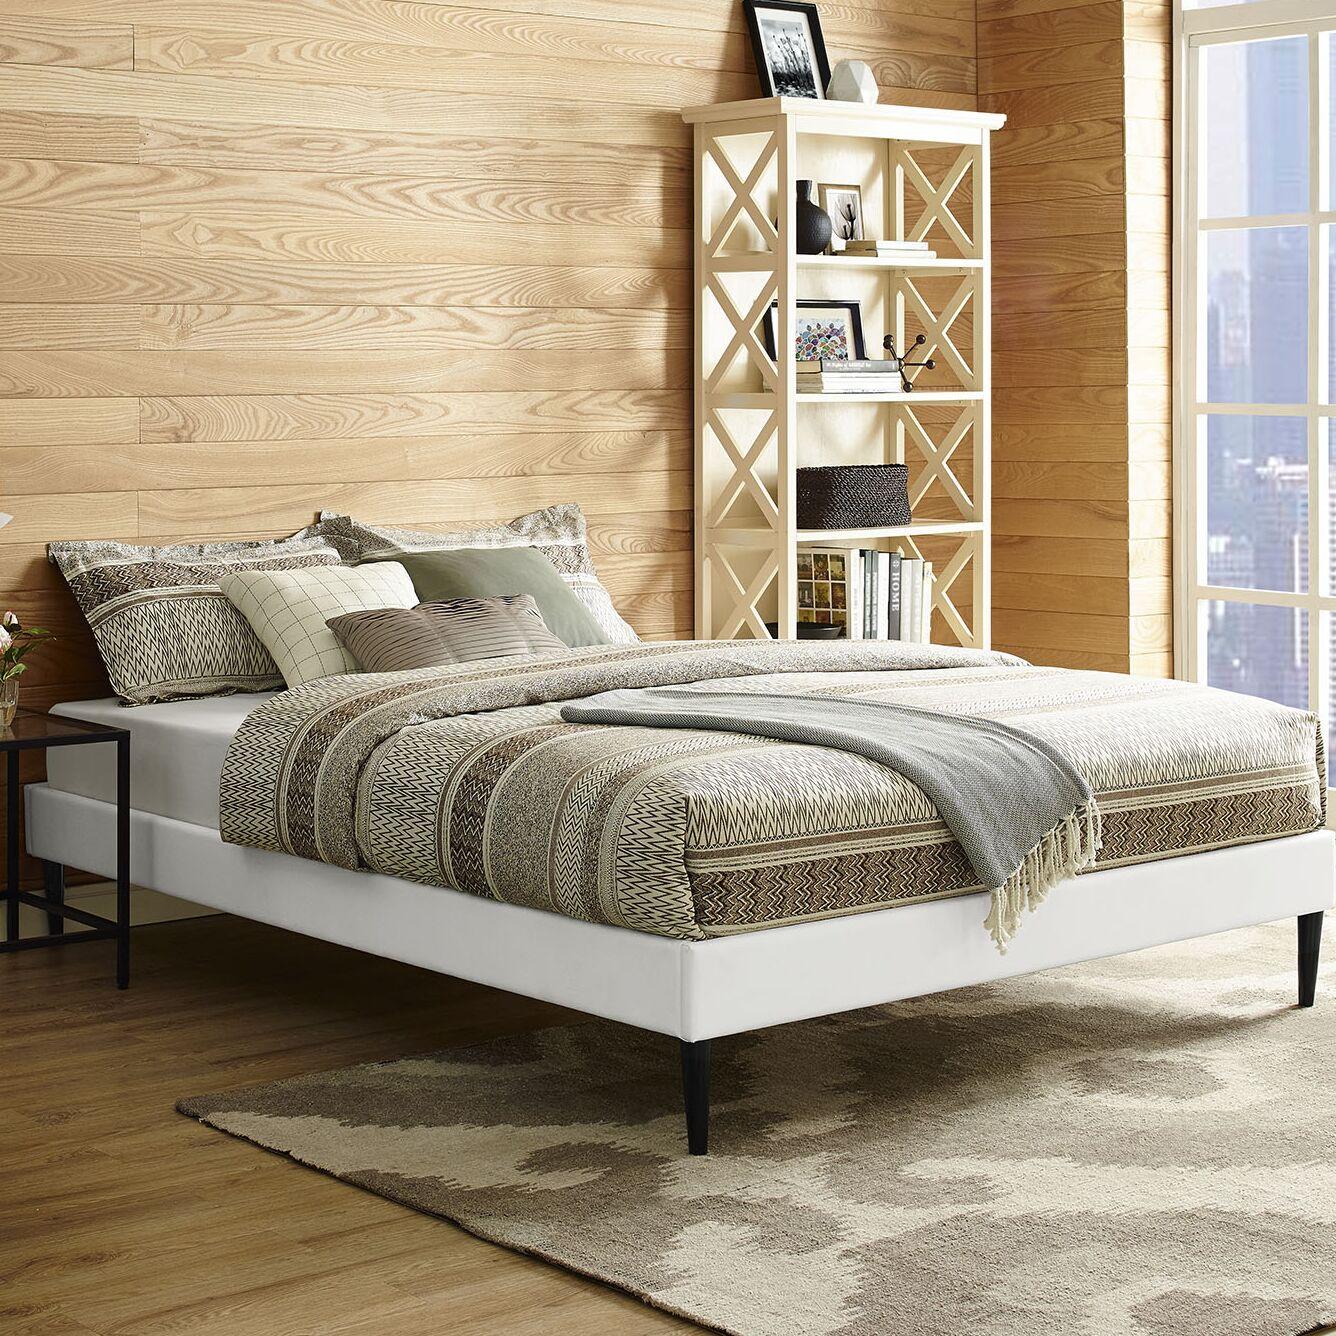 Platform Bed Size: Queen, Color: White